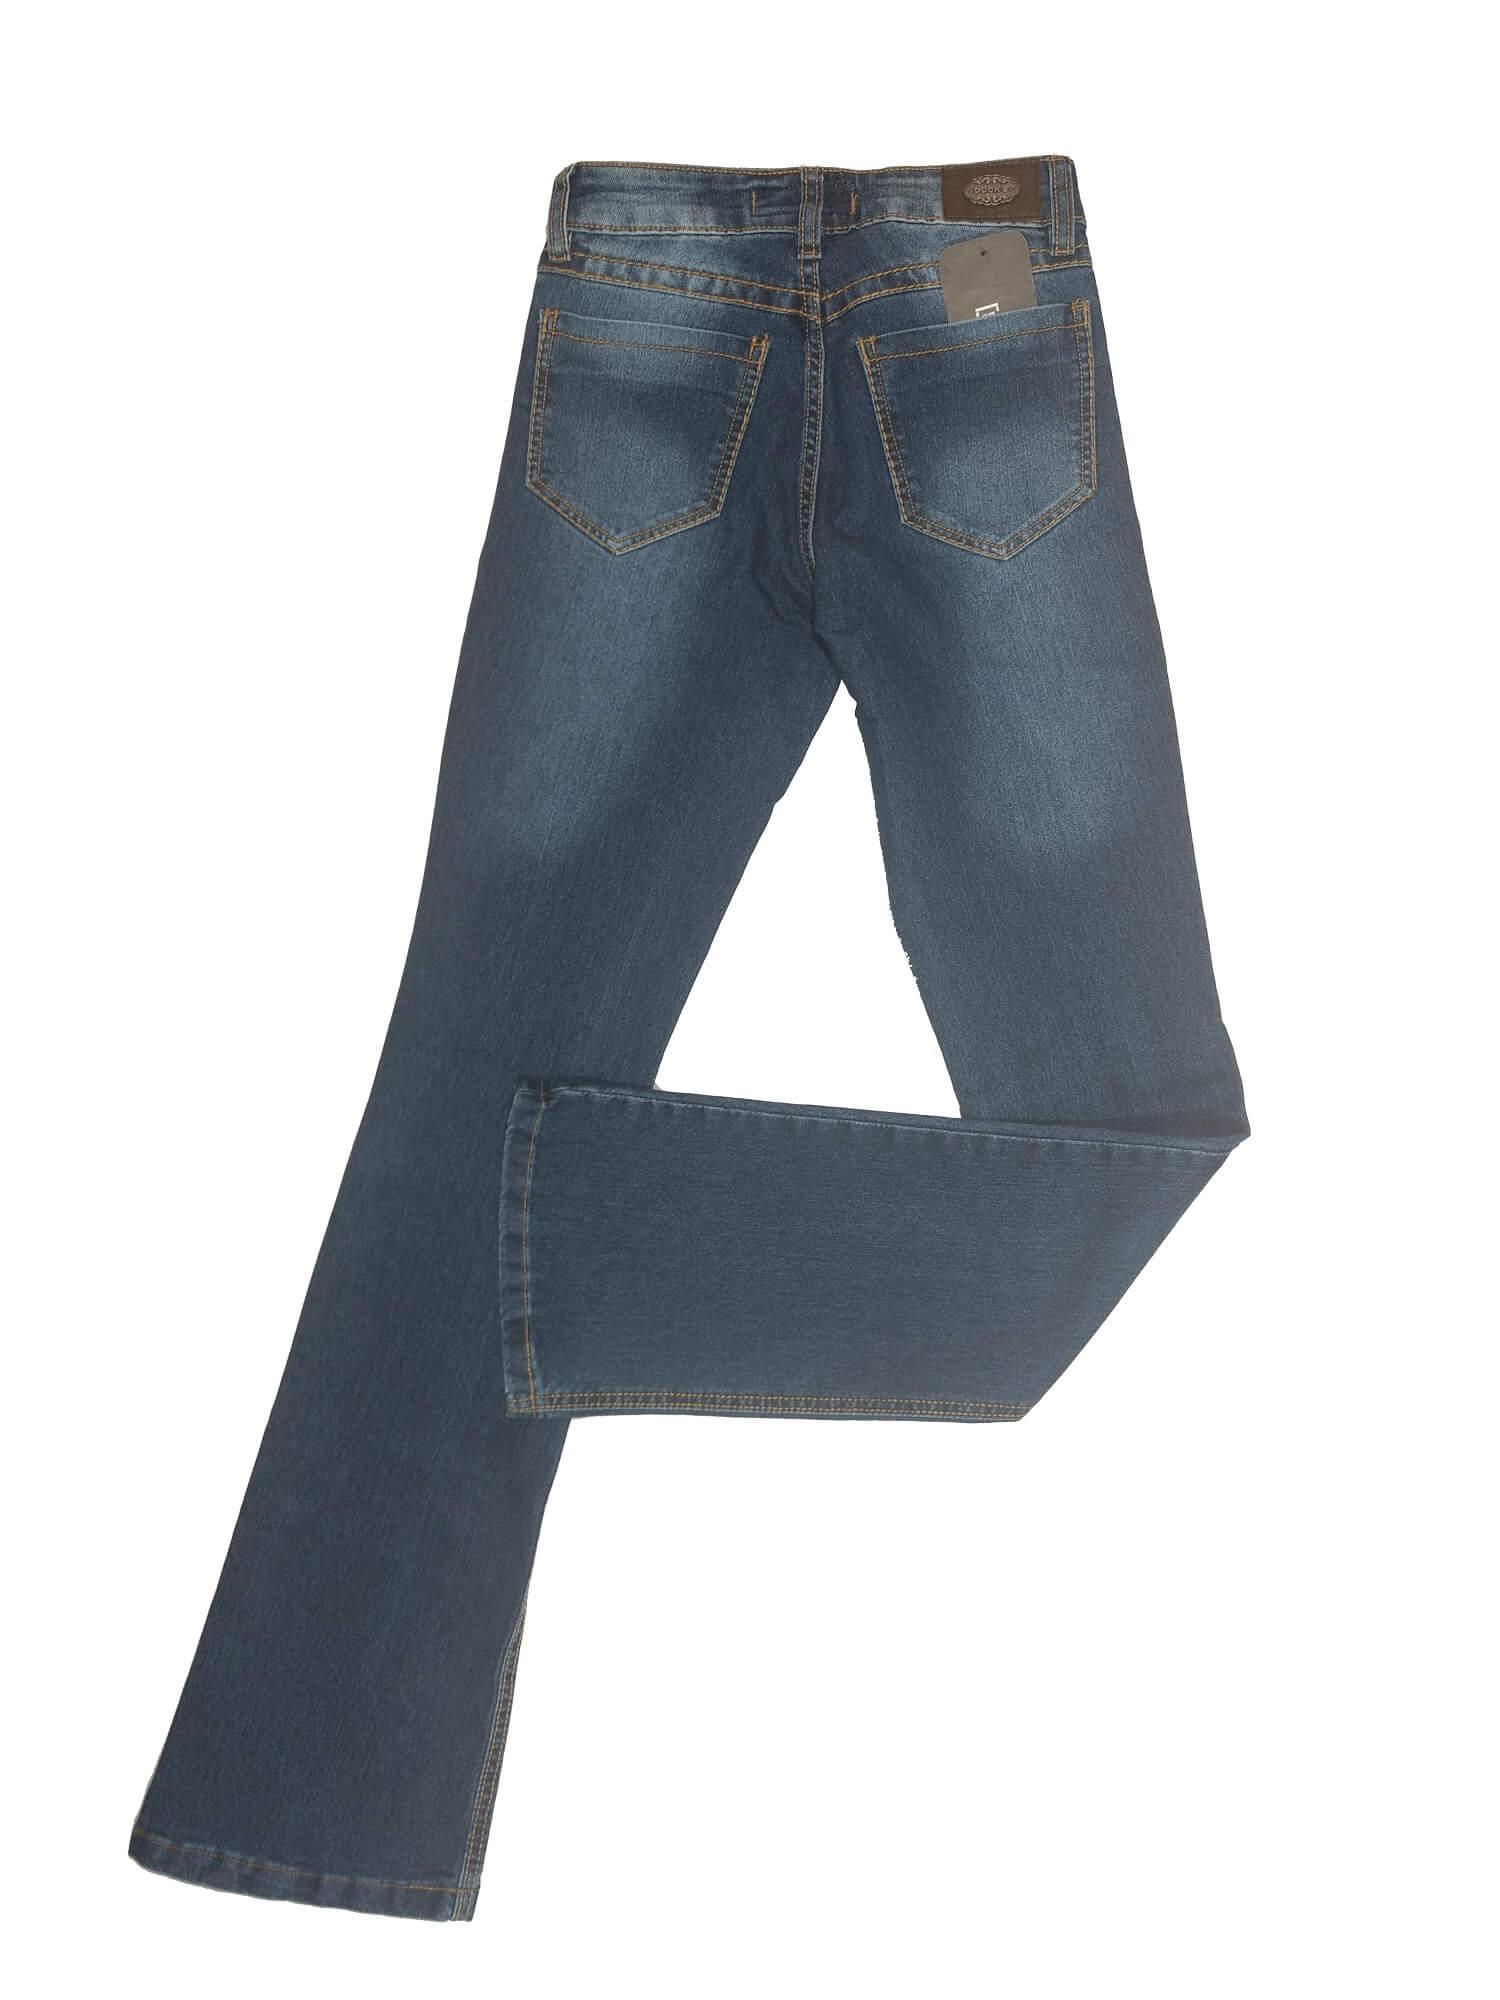 Calça Feminina Dock's Ocre Hot Pants Ref. 002.1417.005